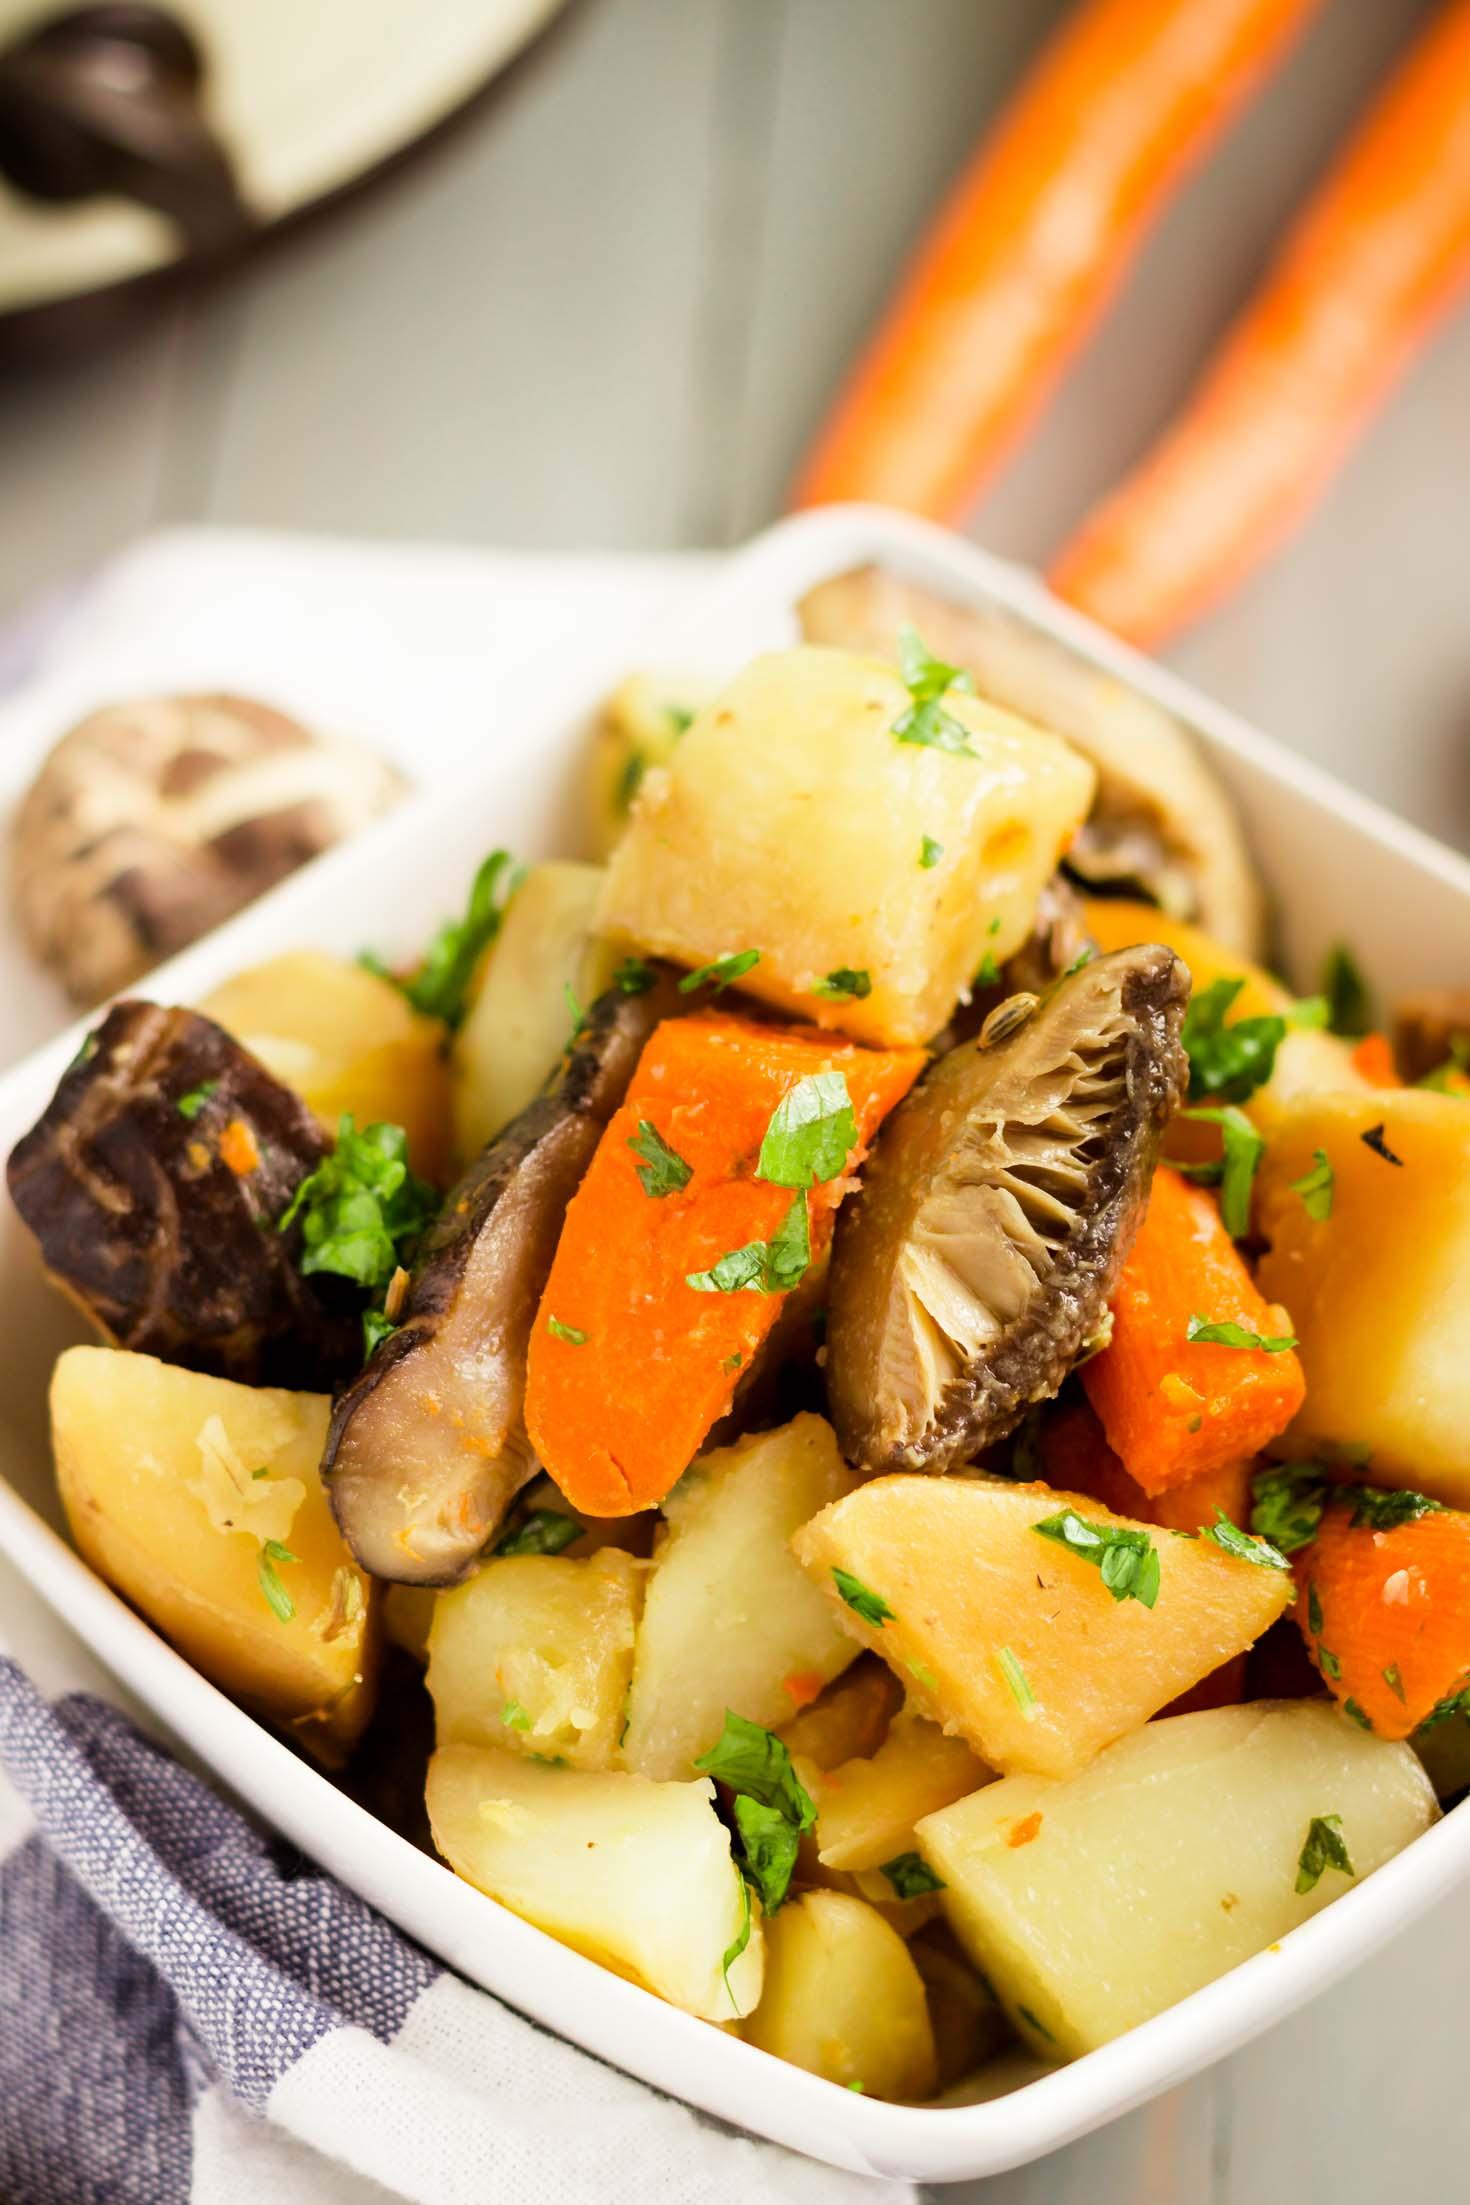 Slow Cooker Shiitake Mushroom Carrot Potato